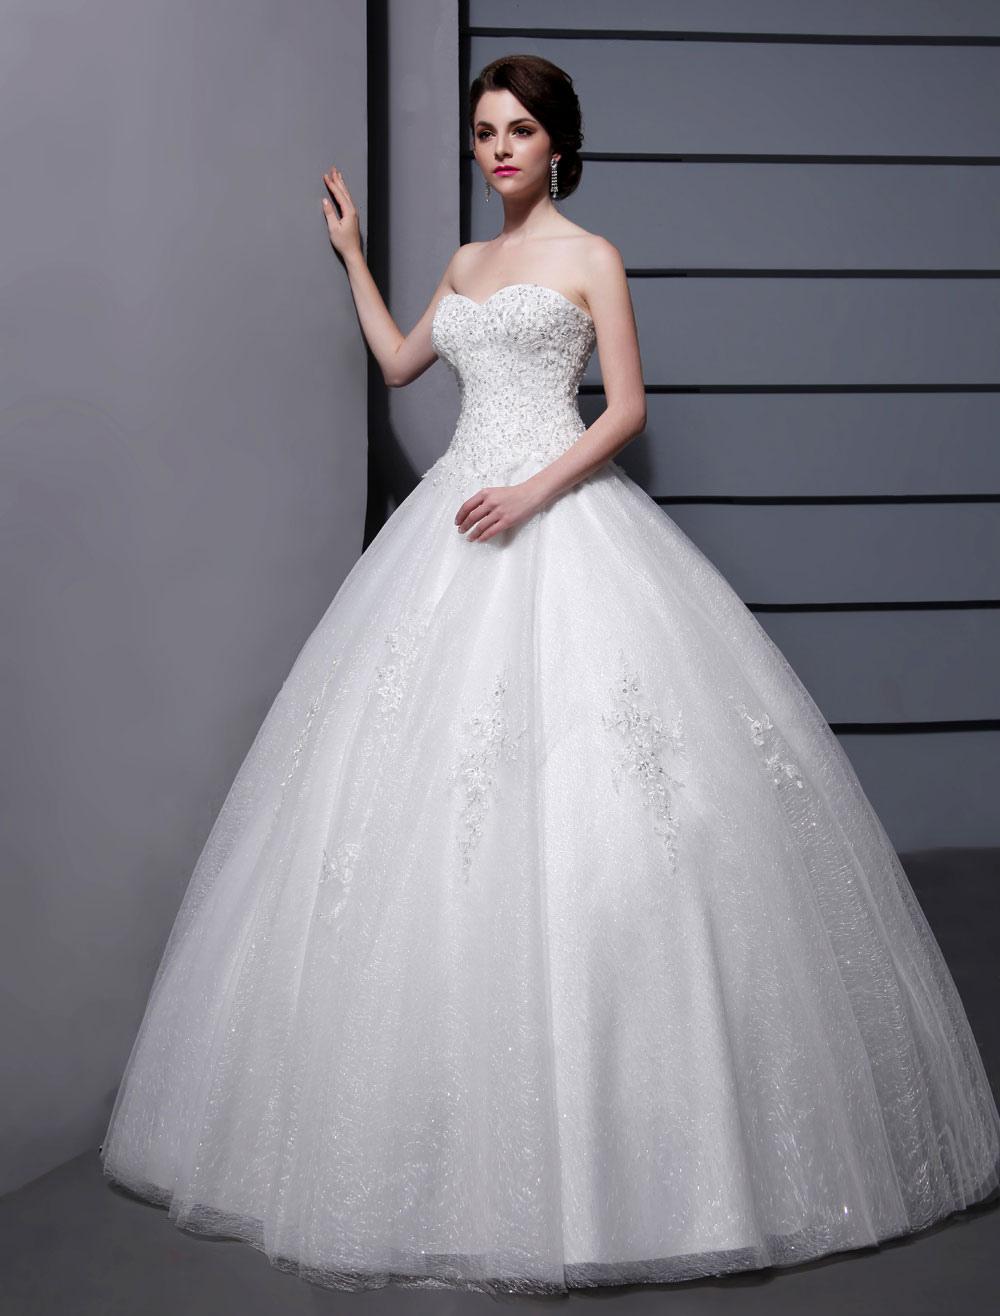 Wedding Dresses Ball Gown Strapless Bridal Dress Ivory Sweetheart ...